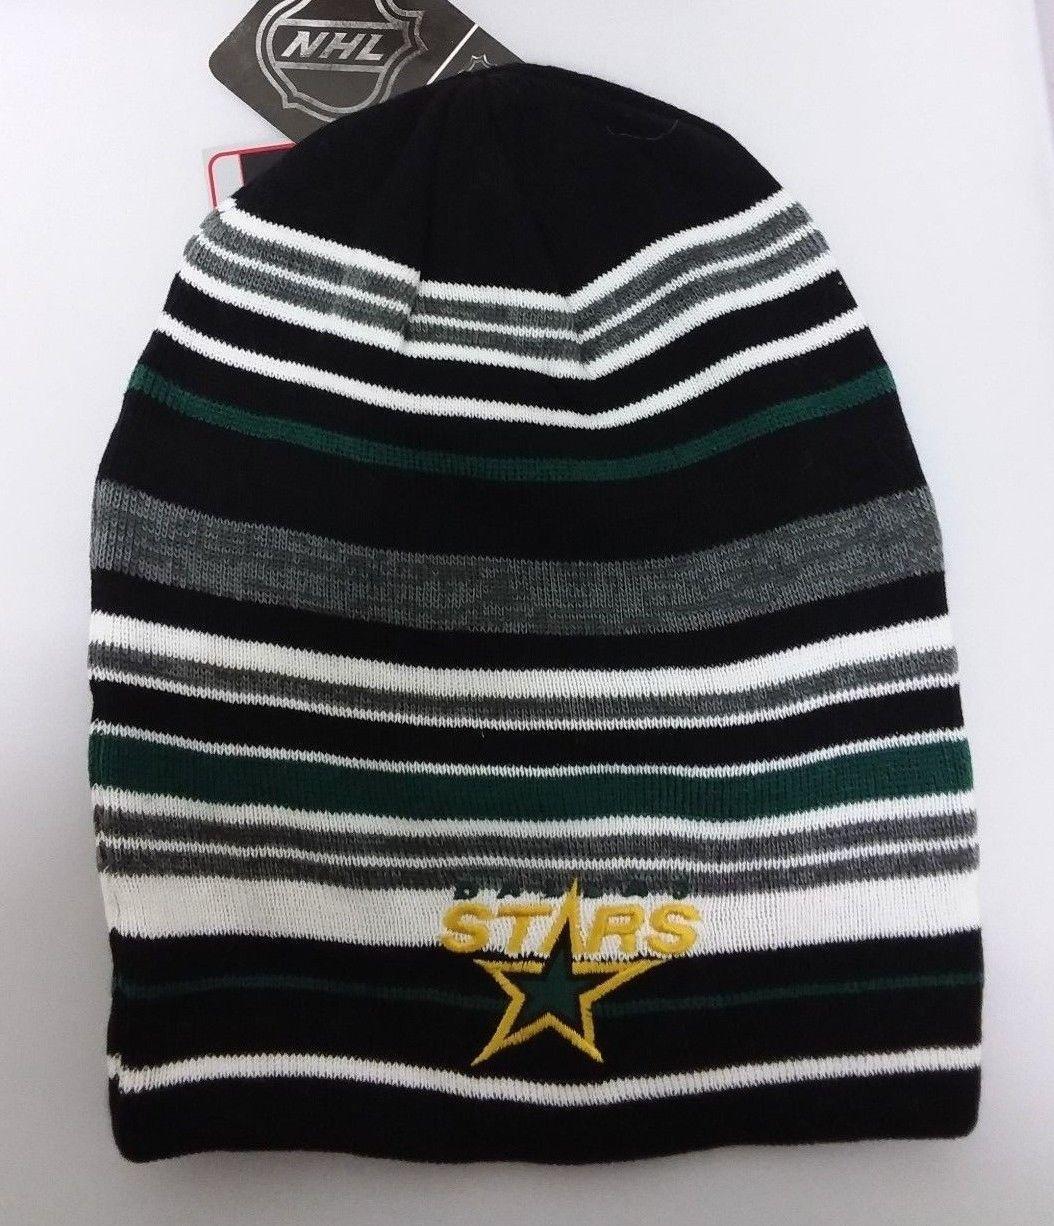 df16a0f64e3 57. 57. Previous. Dallas Stars NHL Reebok Stripe Winter Fitted Cuffless Knit  Beanie Hat Skull Cap · Dallas Stars NHL Reebok ...